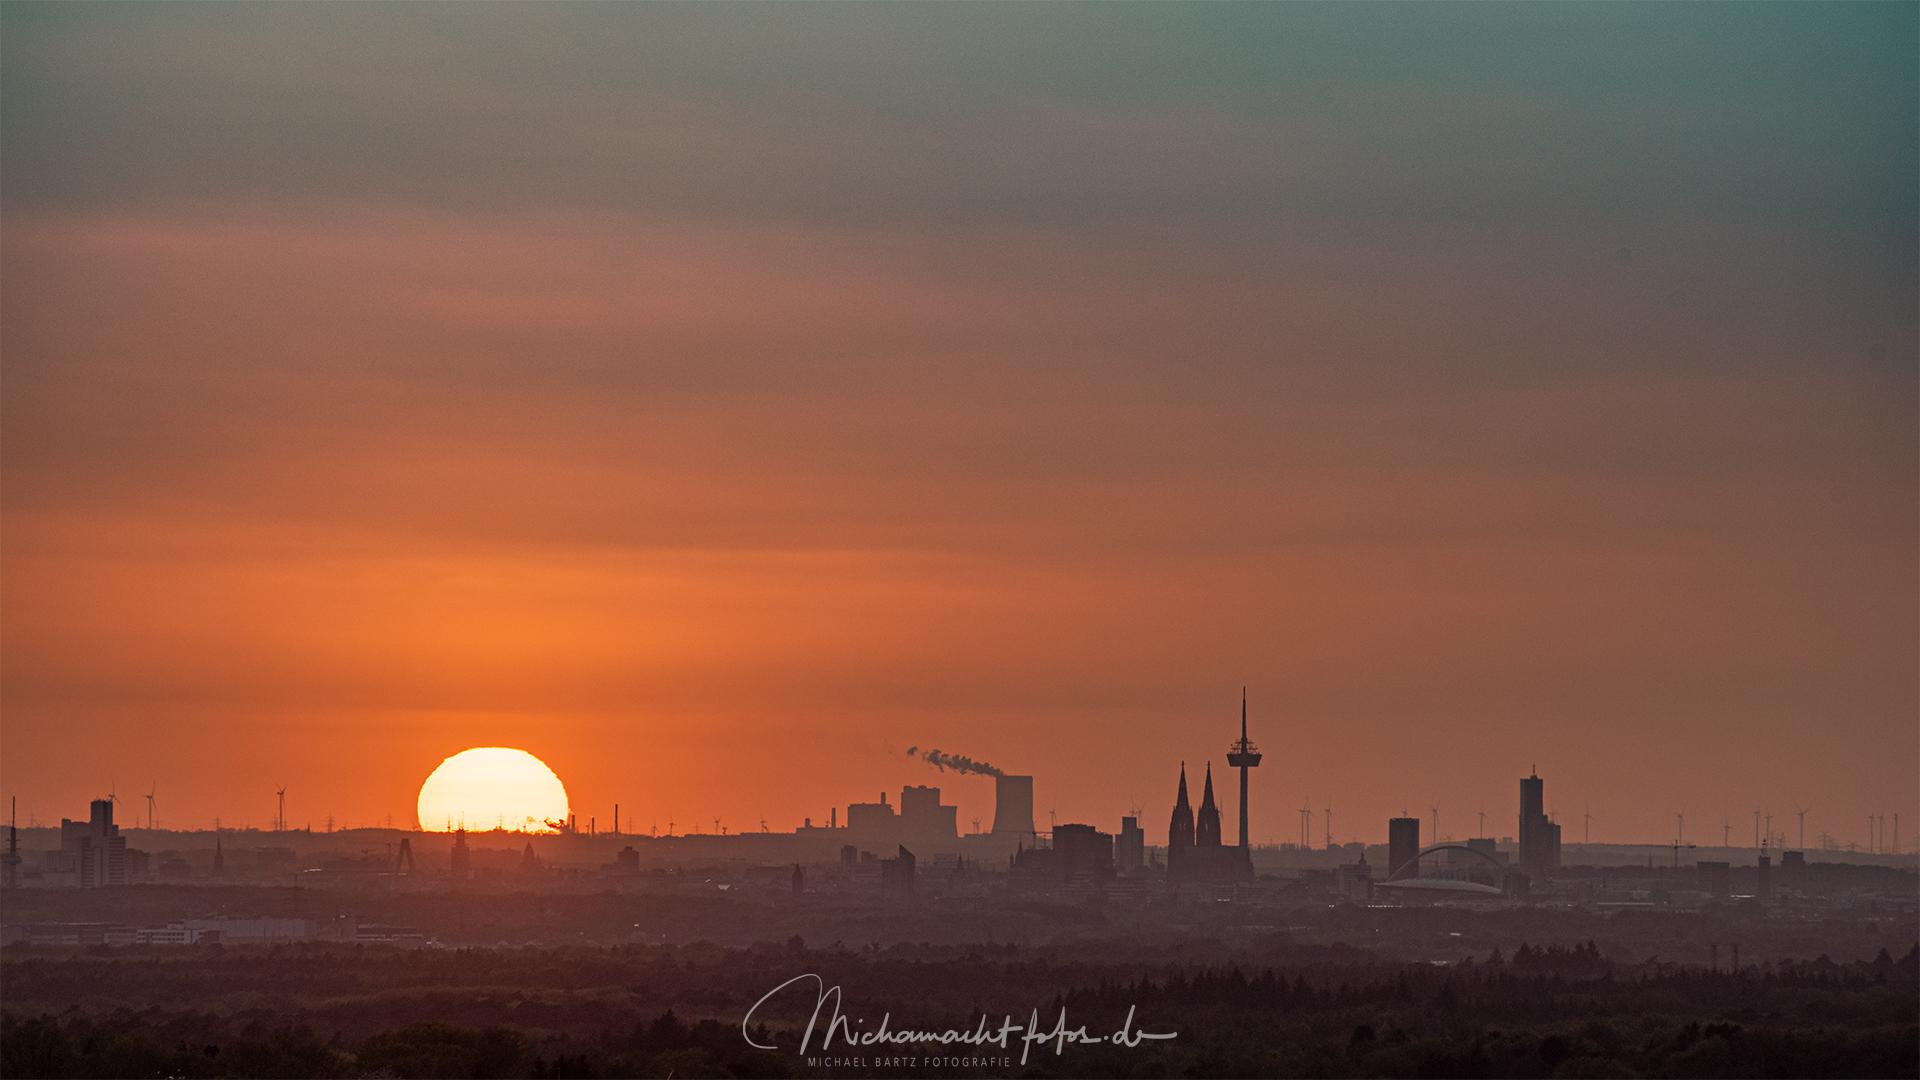 Kölner Skyline bei Sonnenuntergang, Germany